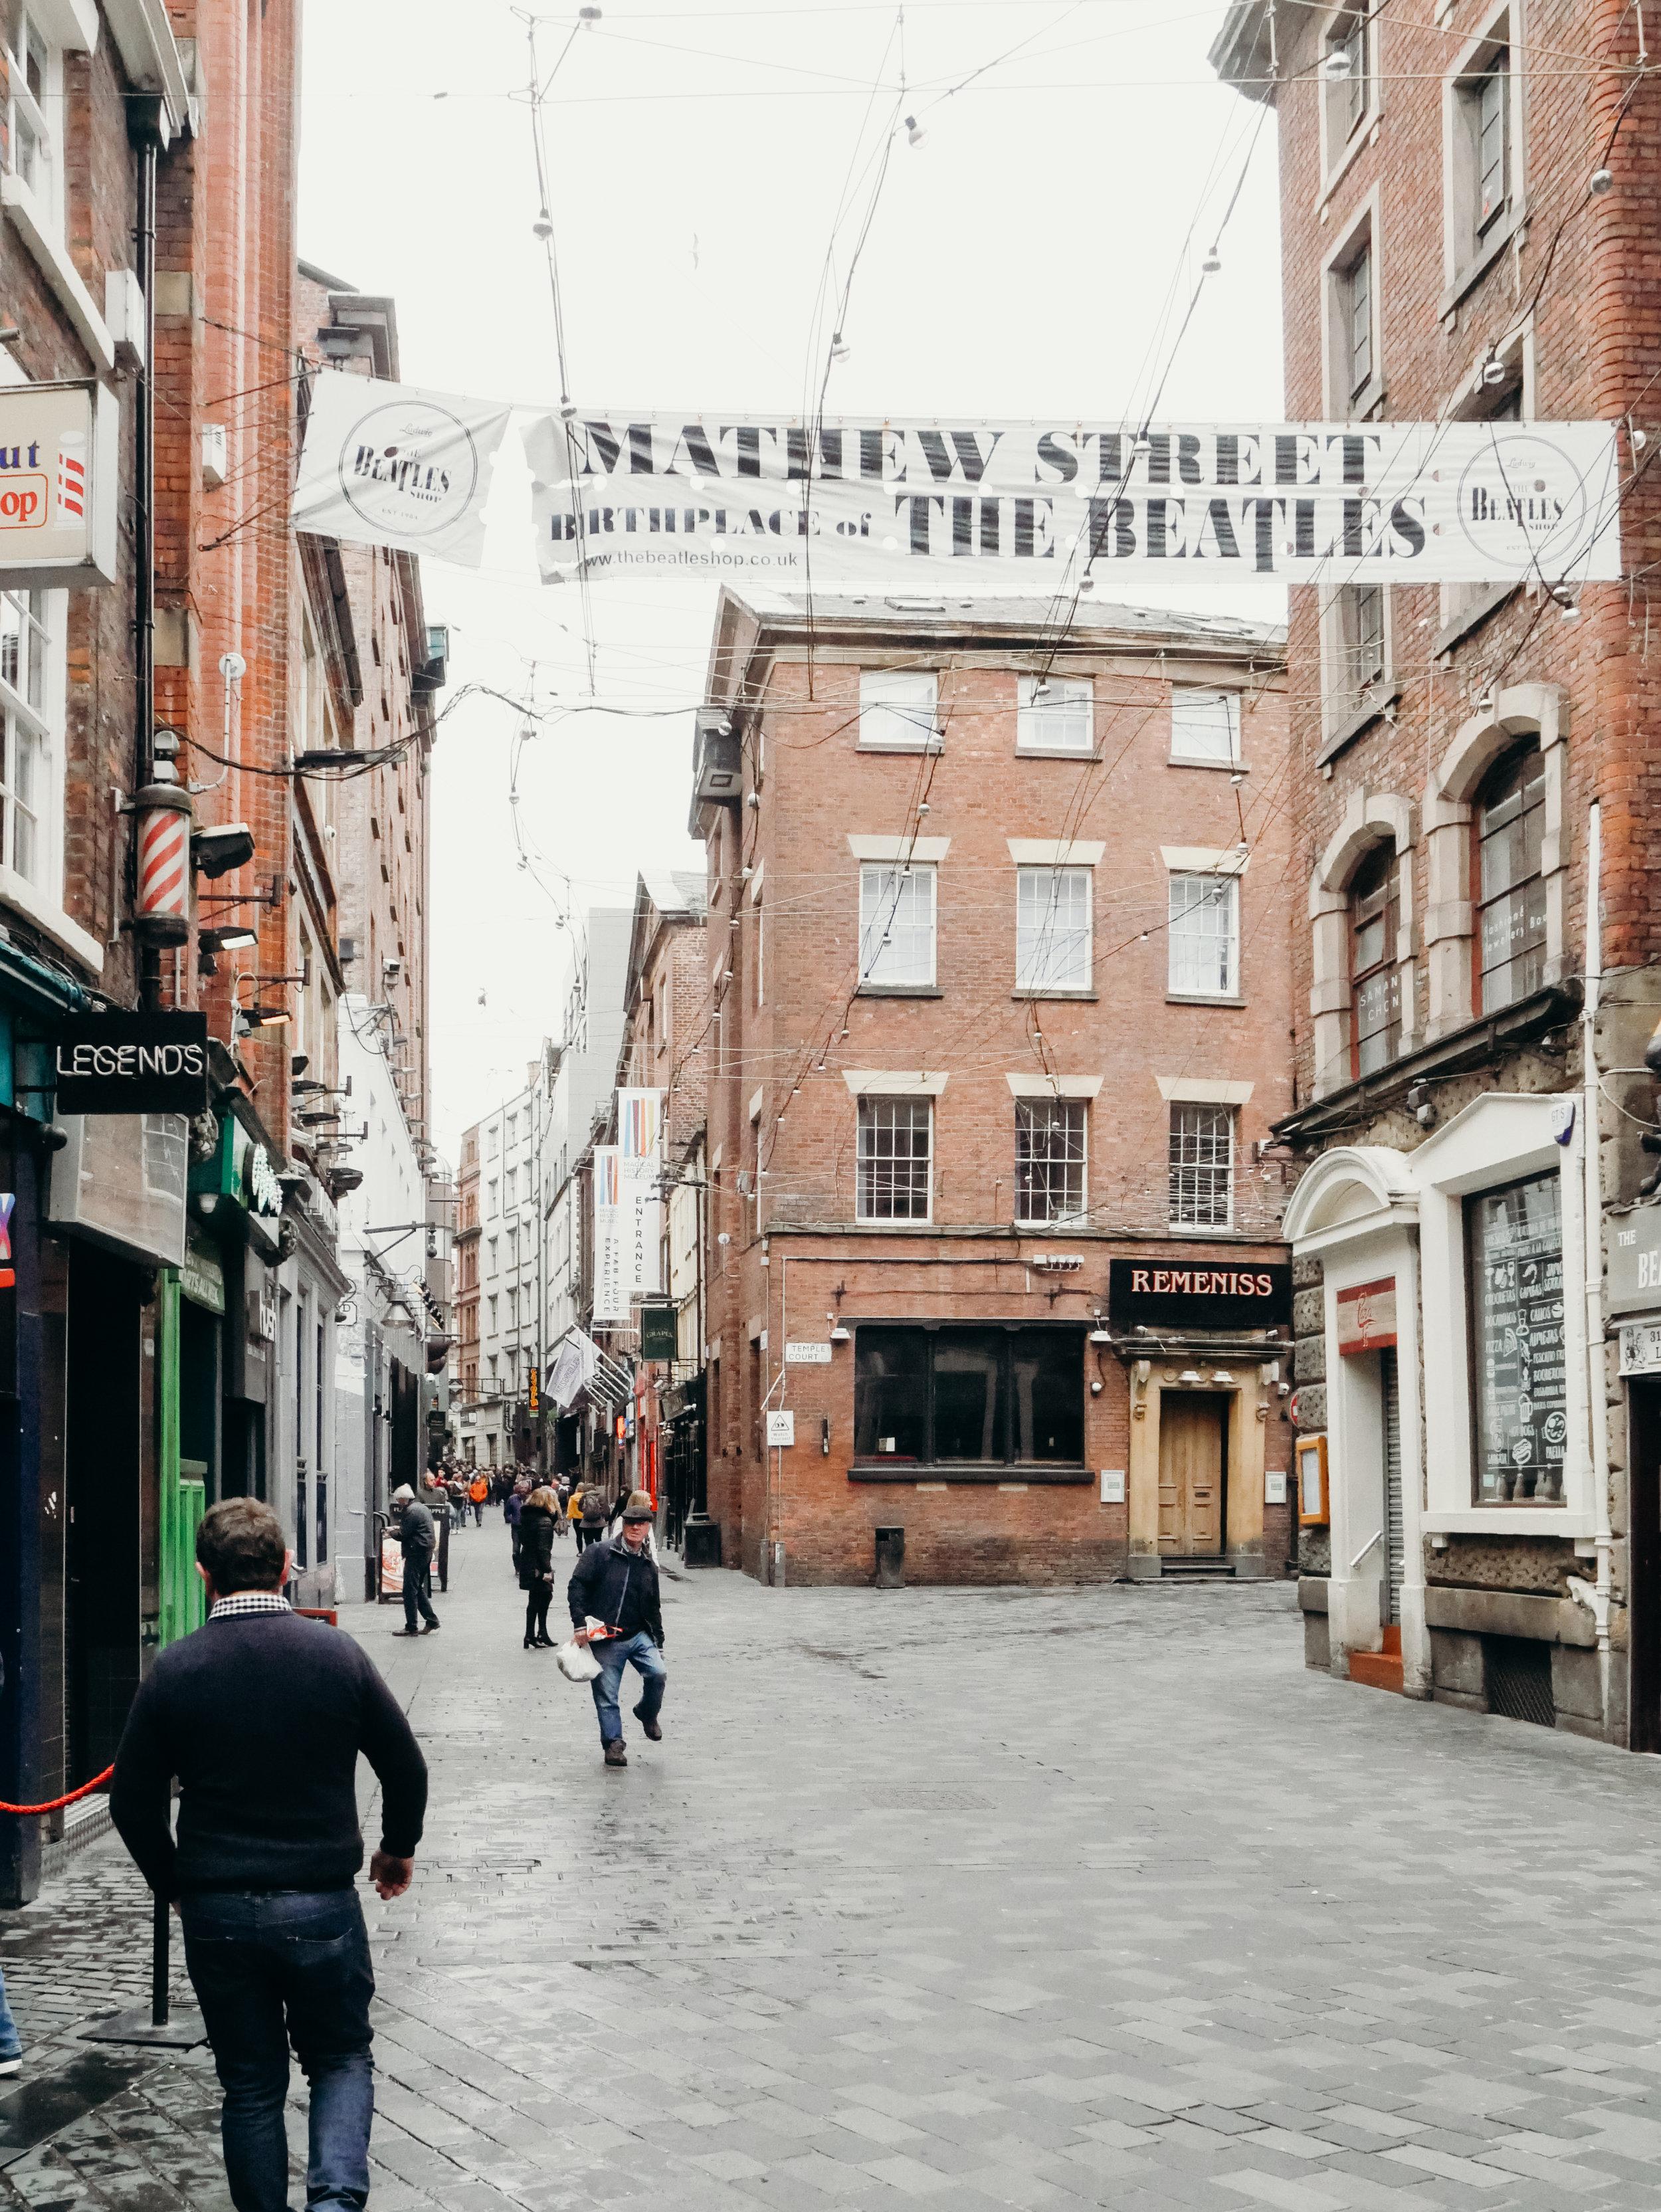 Matthew Street Liverpool